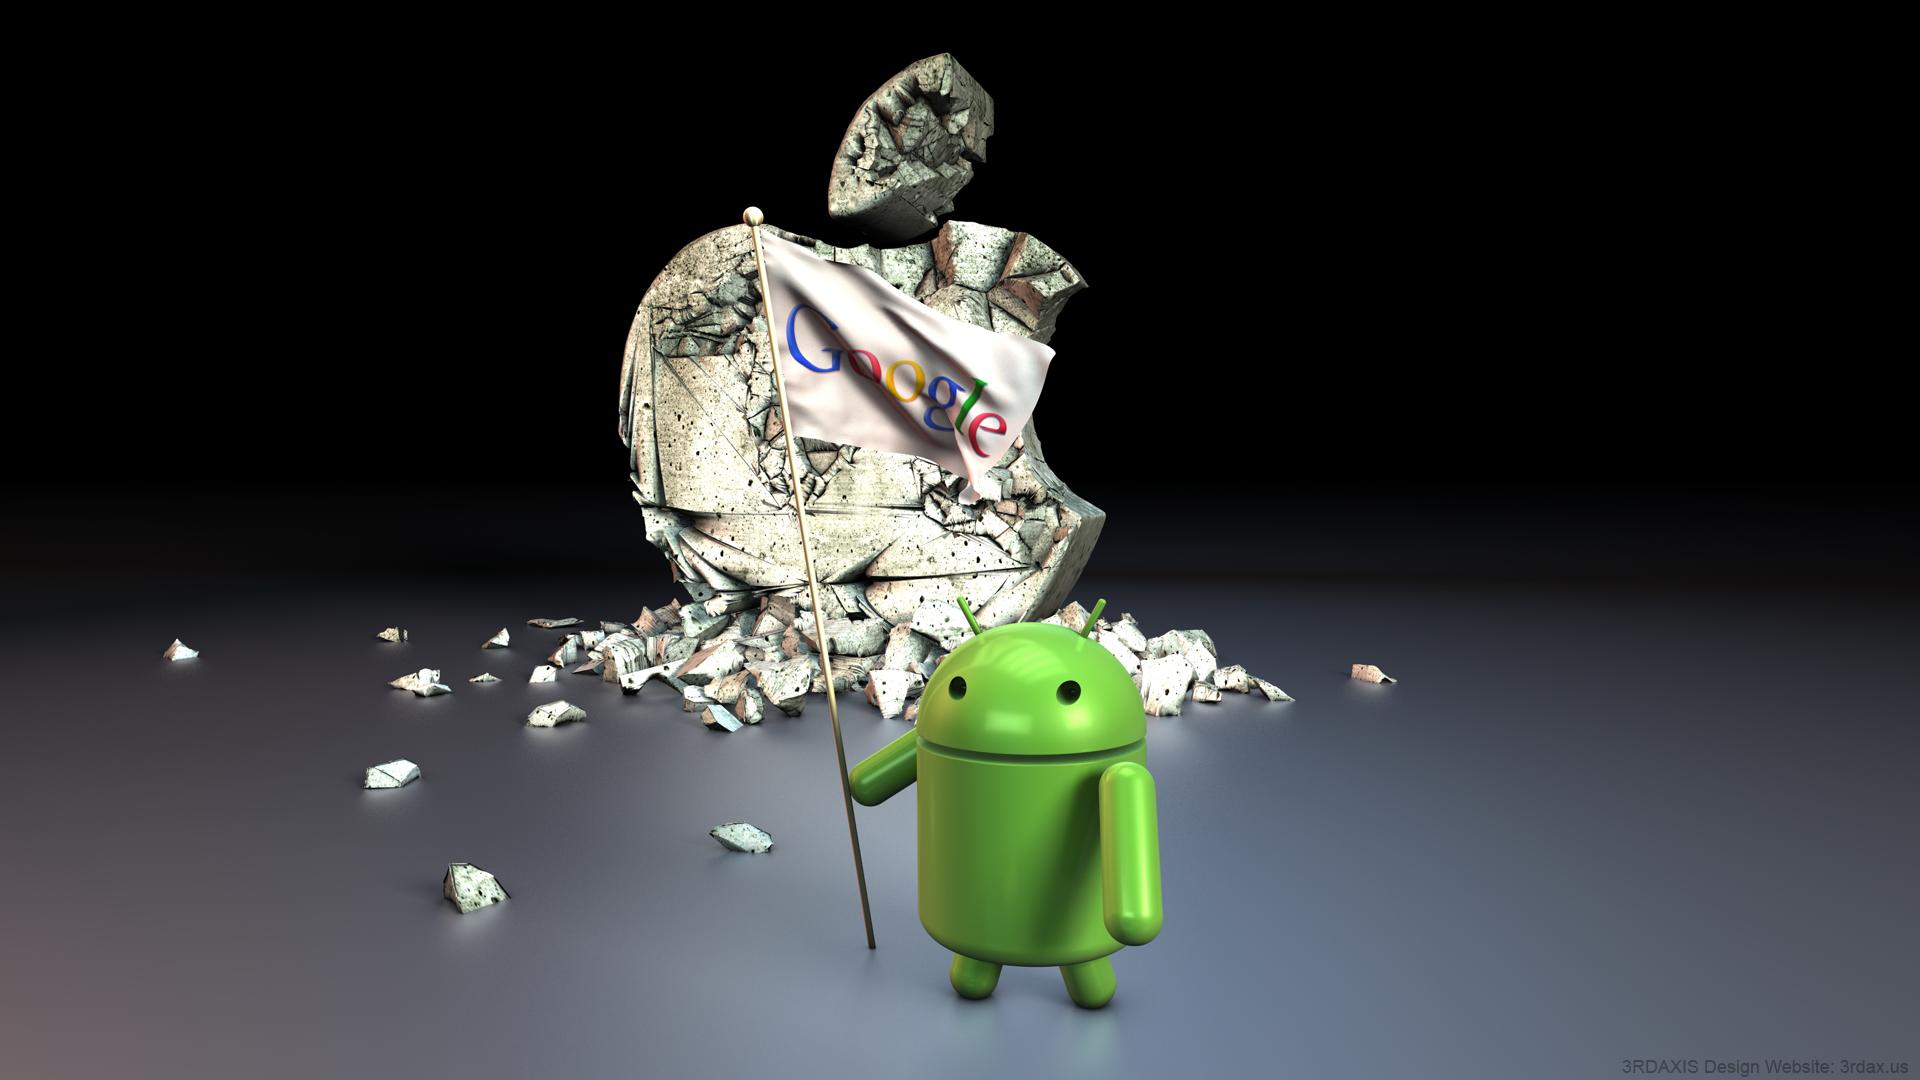 Muy buen Wallpaper de Android Vs Apple con resolucin Full HD para 1920x1080